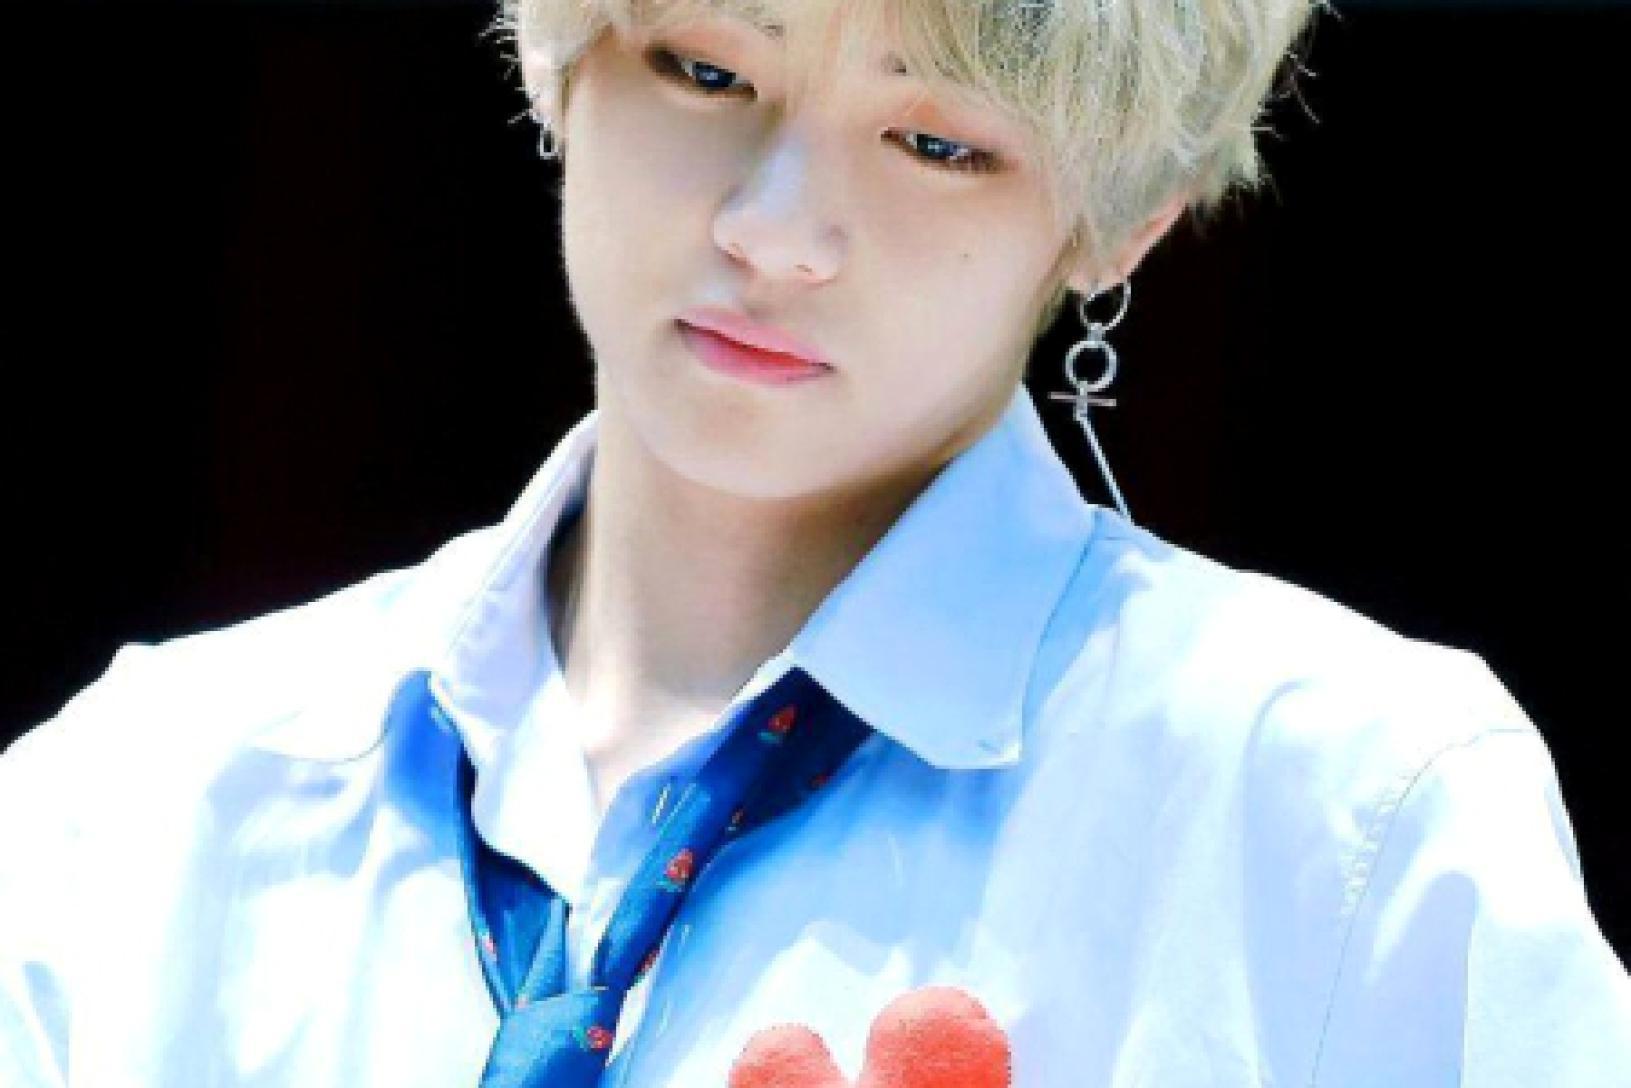 Jin BTS Cute Wallpapers Top Free Jin BTS Cute Backgrounds